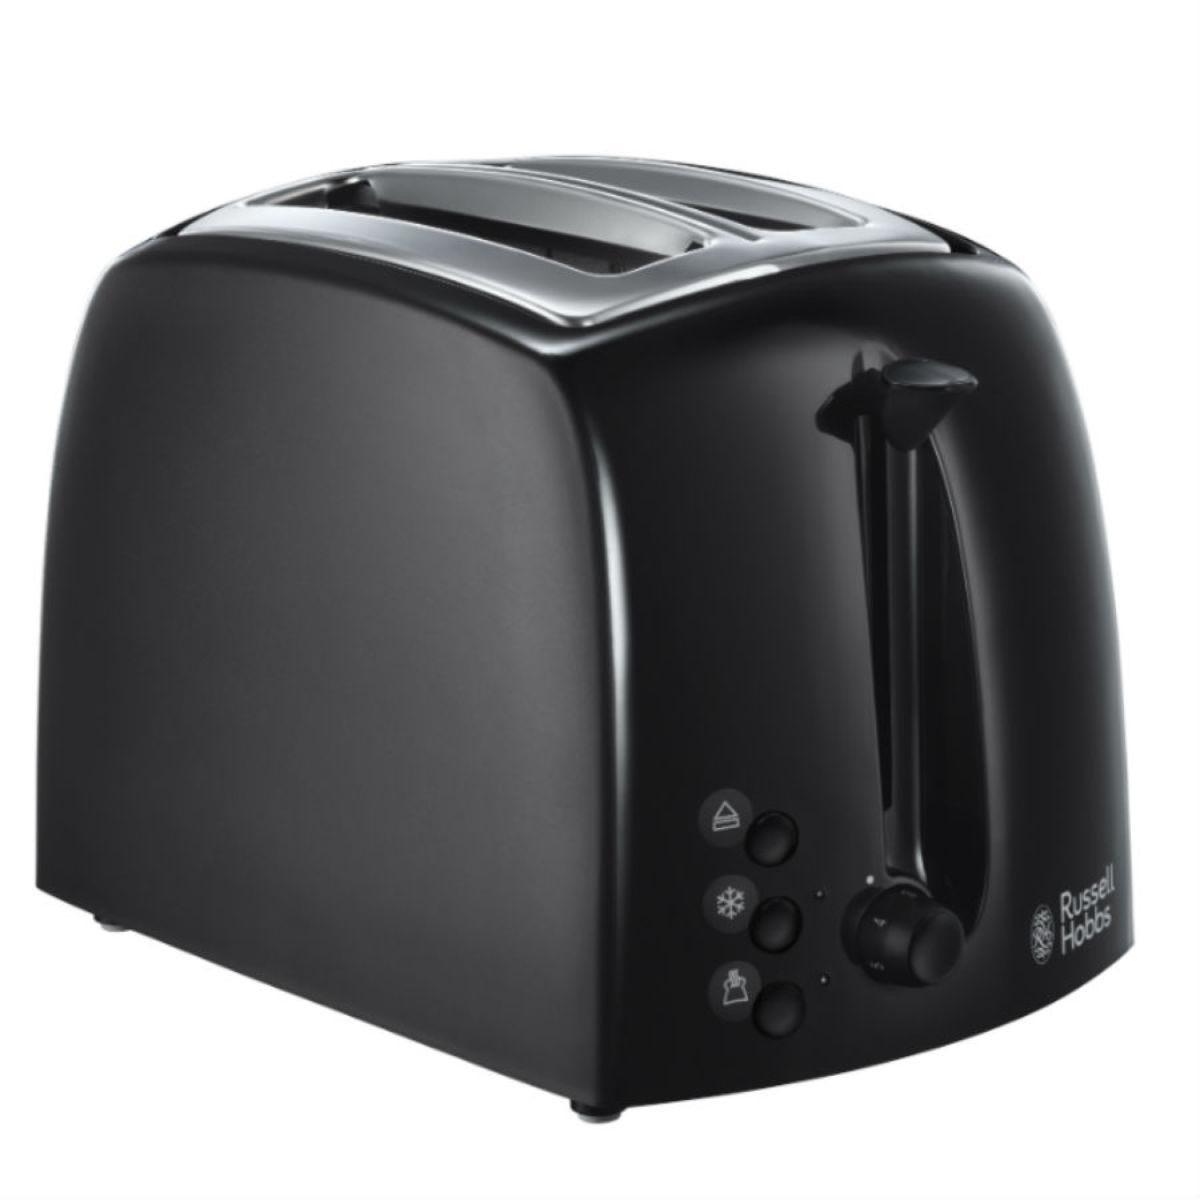 Russell Hobbs 21641 Textures 2-Slice Toaster - Black